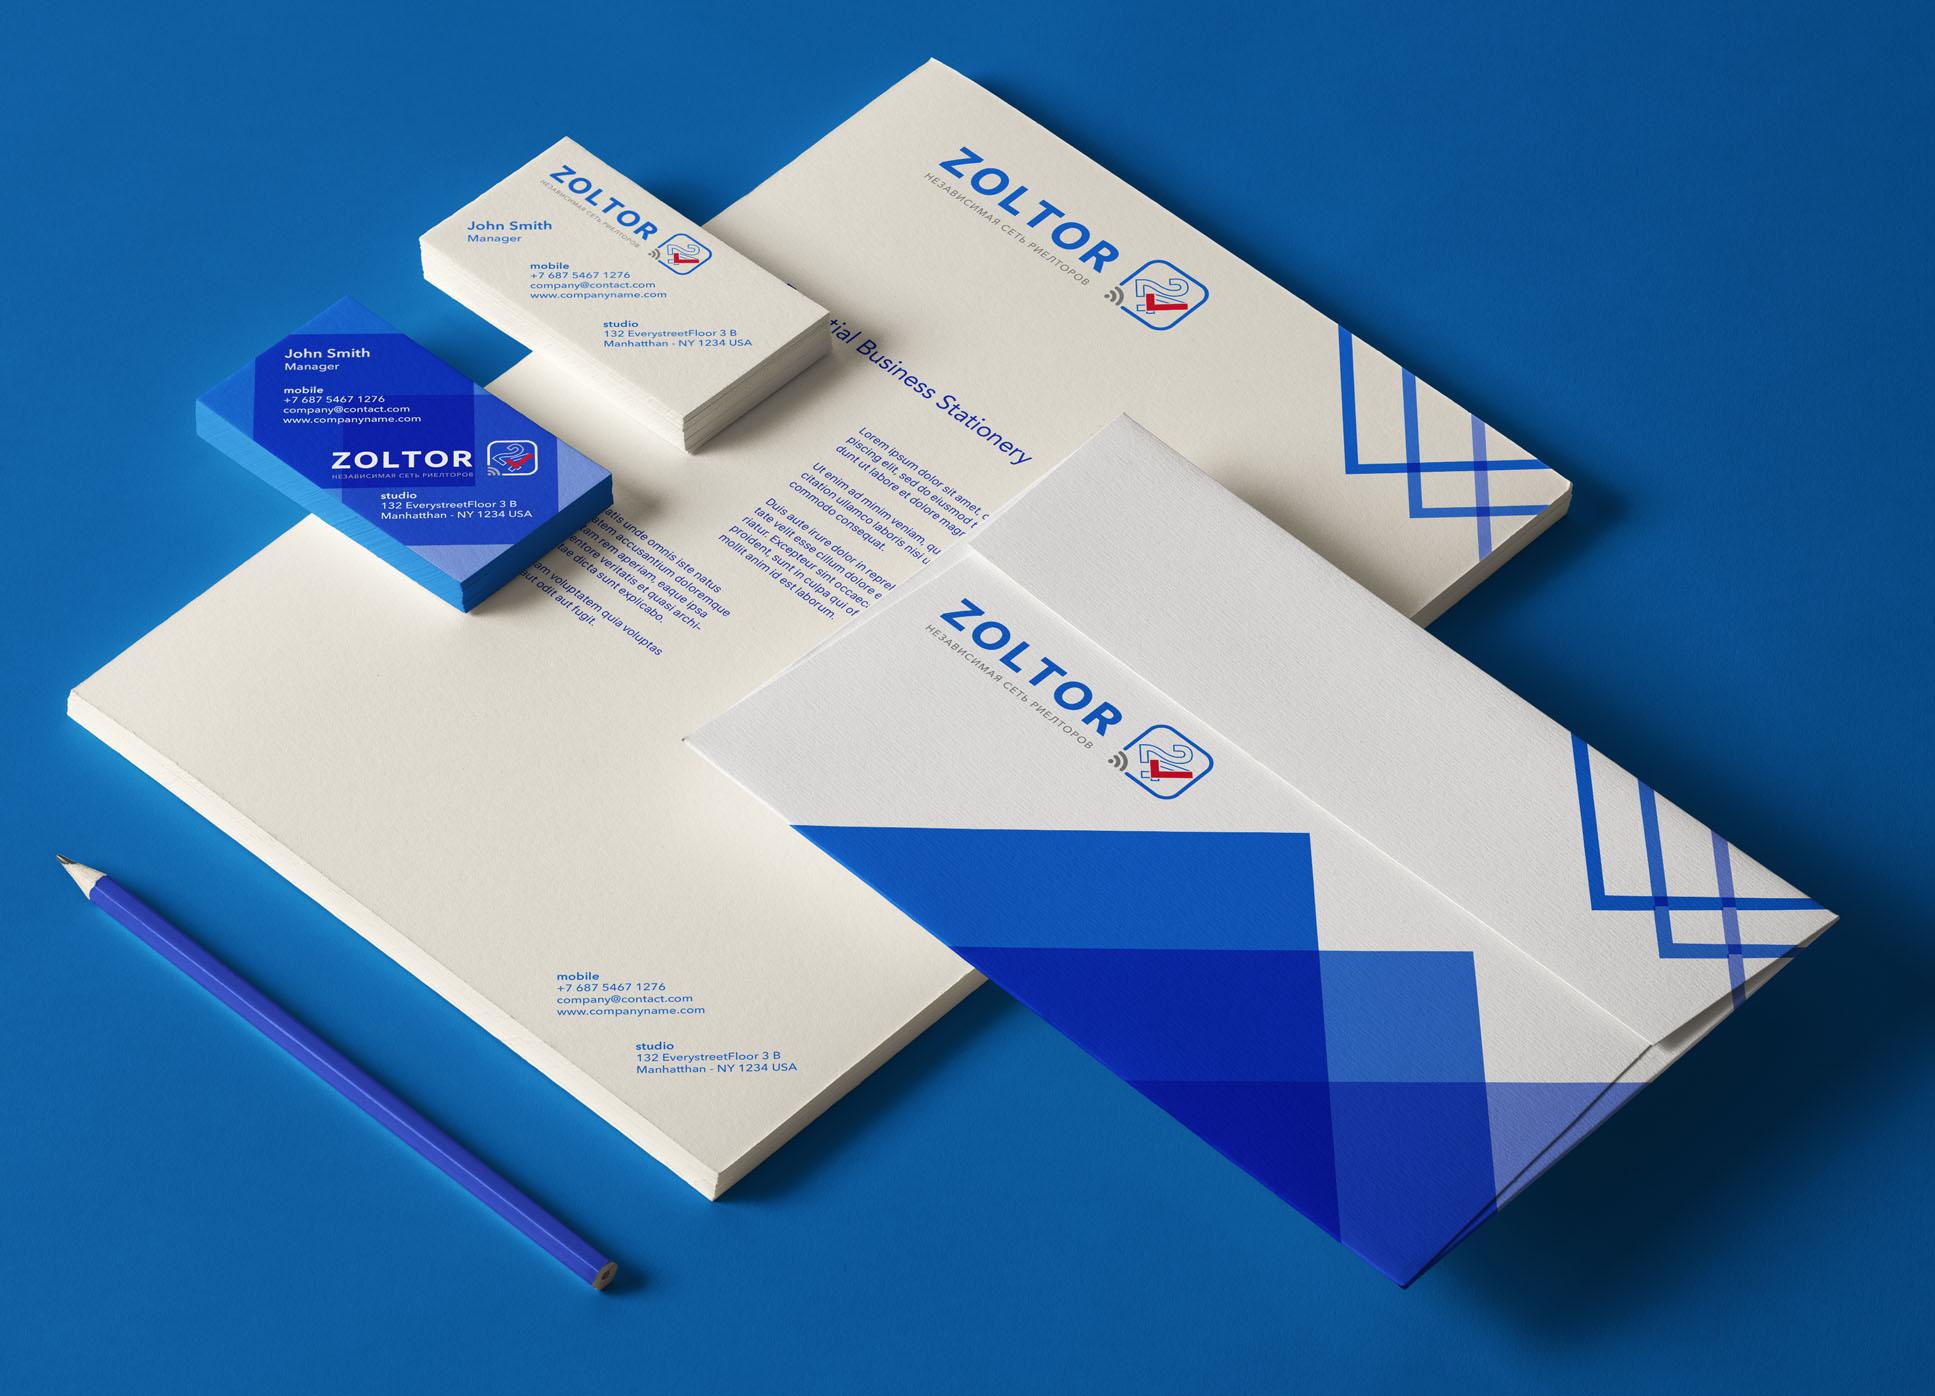 Логотип и фирменный стиль ZolTor24 фото f_0355c911ce53981c.jpg